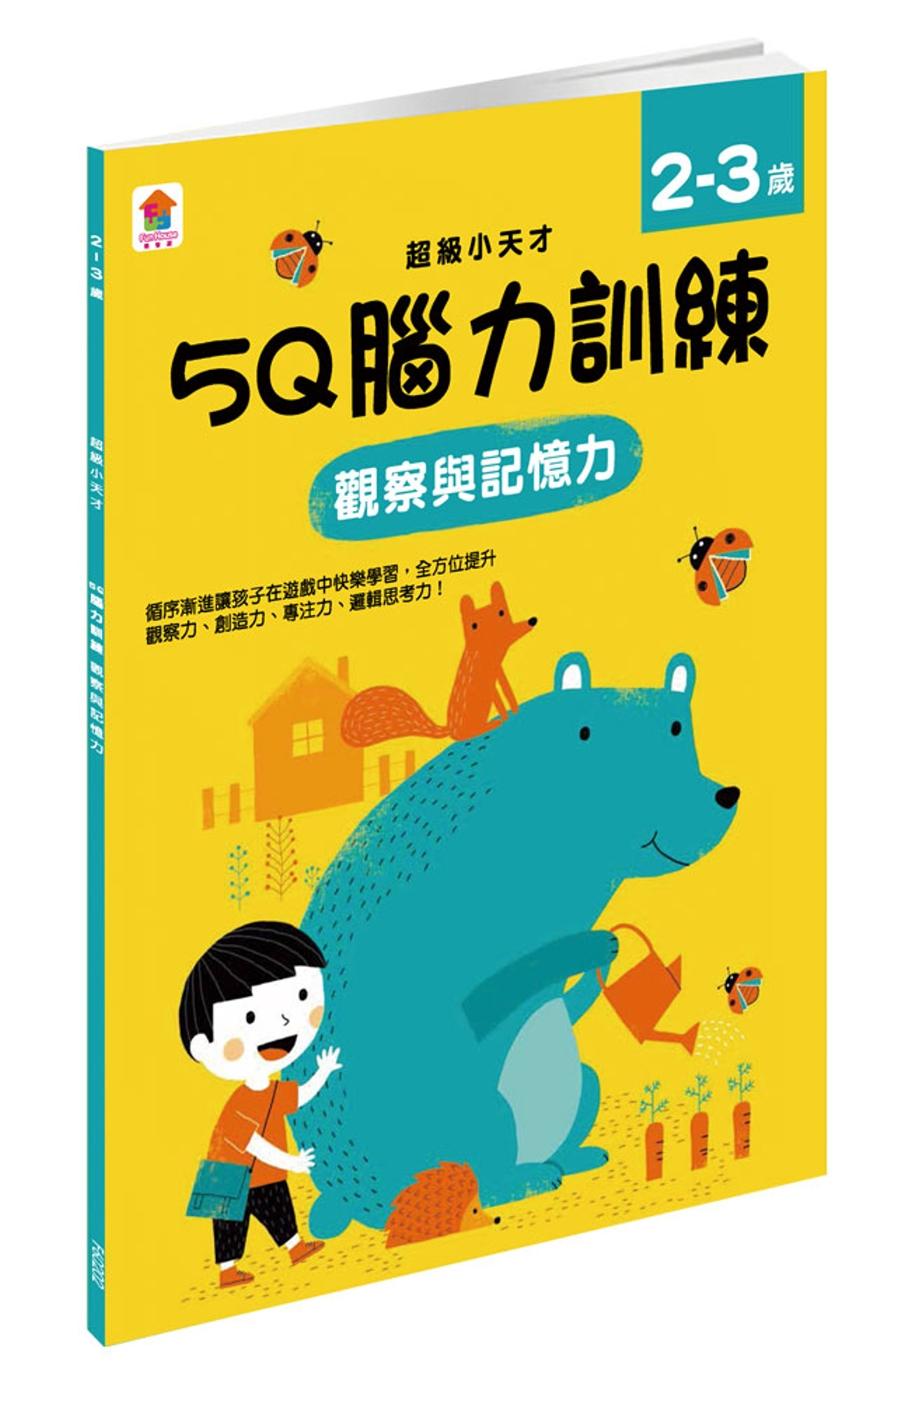 5Q 腦力訓練:2-3歲(觀察與記憶力)(1本練習本+75張貼紙)